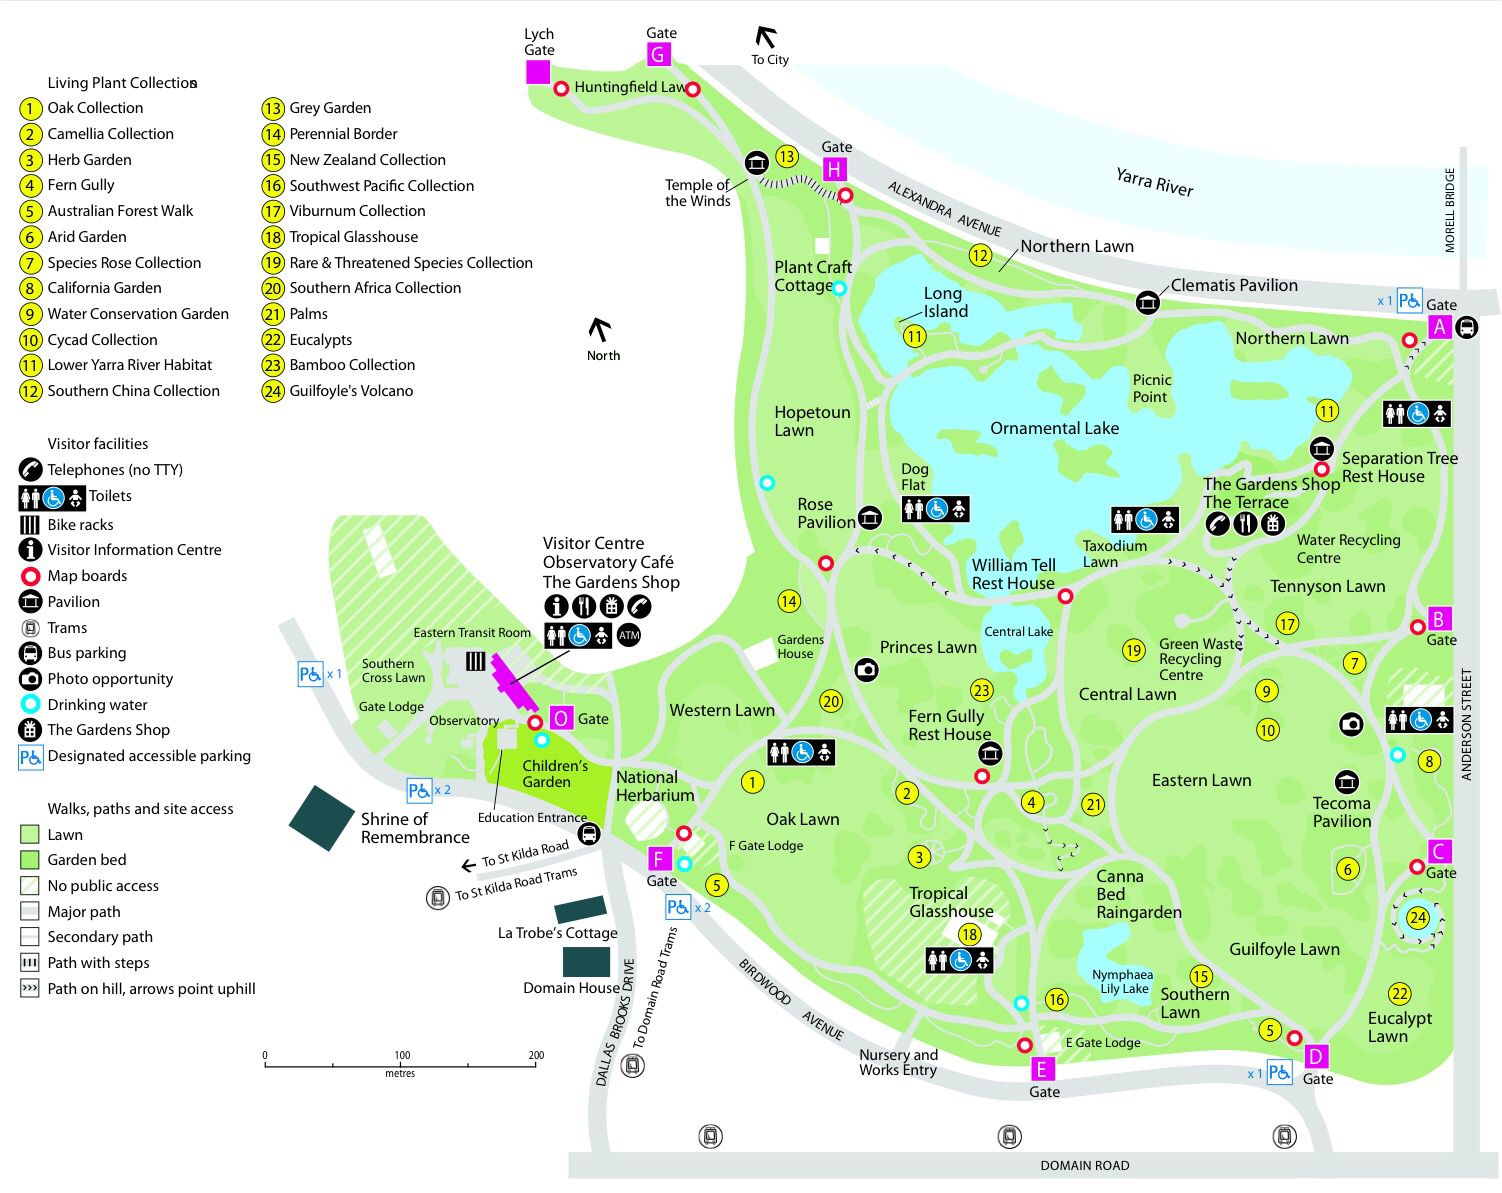 8c3618495c1f31be68b1f9e61766819f - Hong Kong Zoological And Botanical Gardens Map